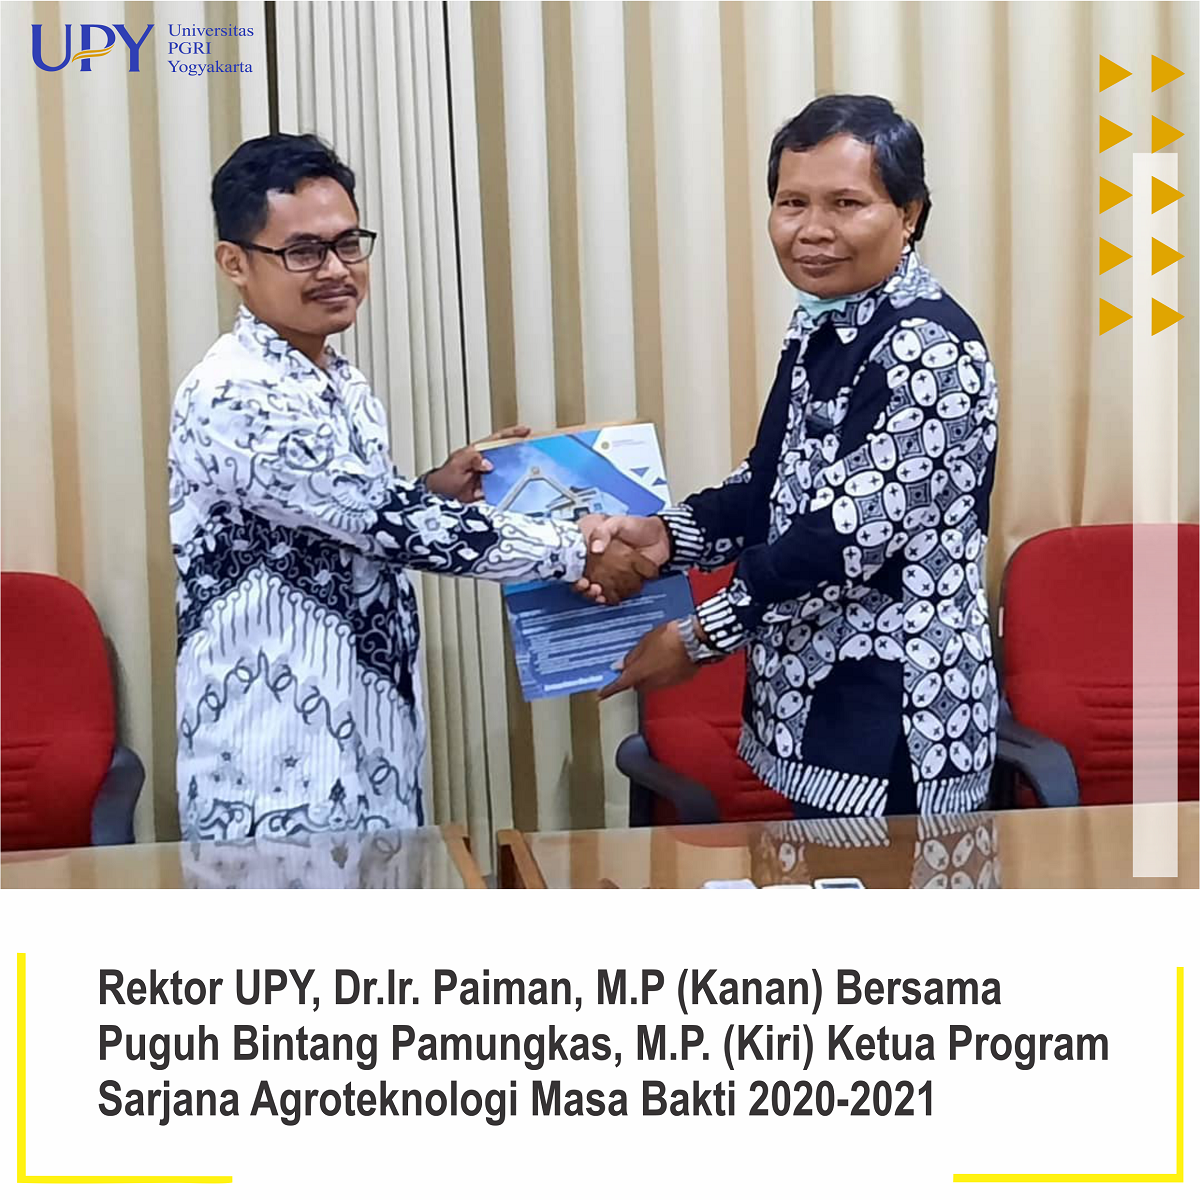 Rektor UPY Lantik Ketua Prosa Agroteknologi